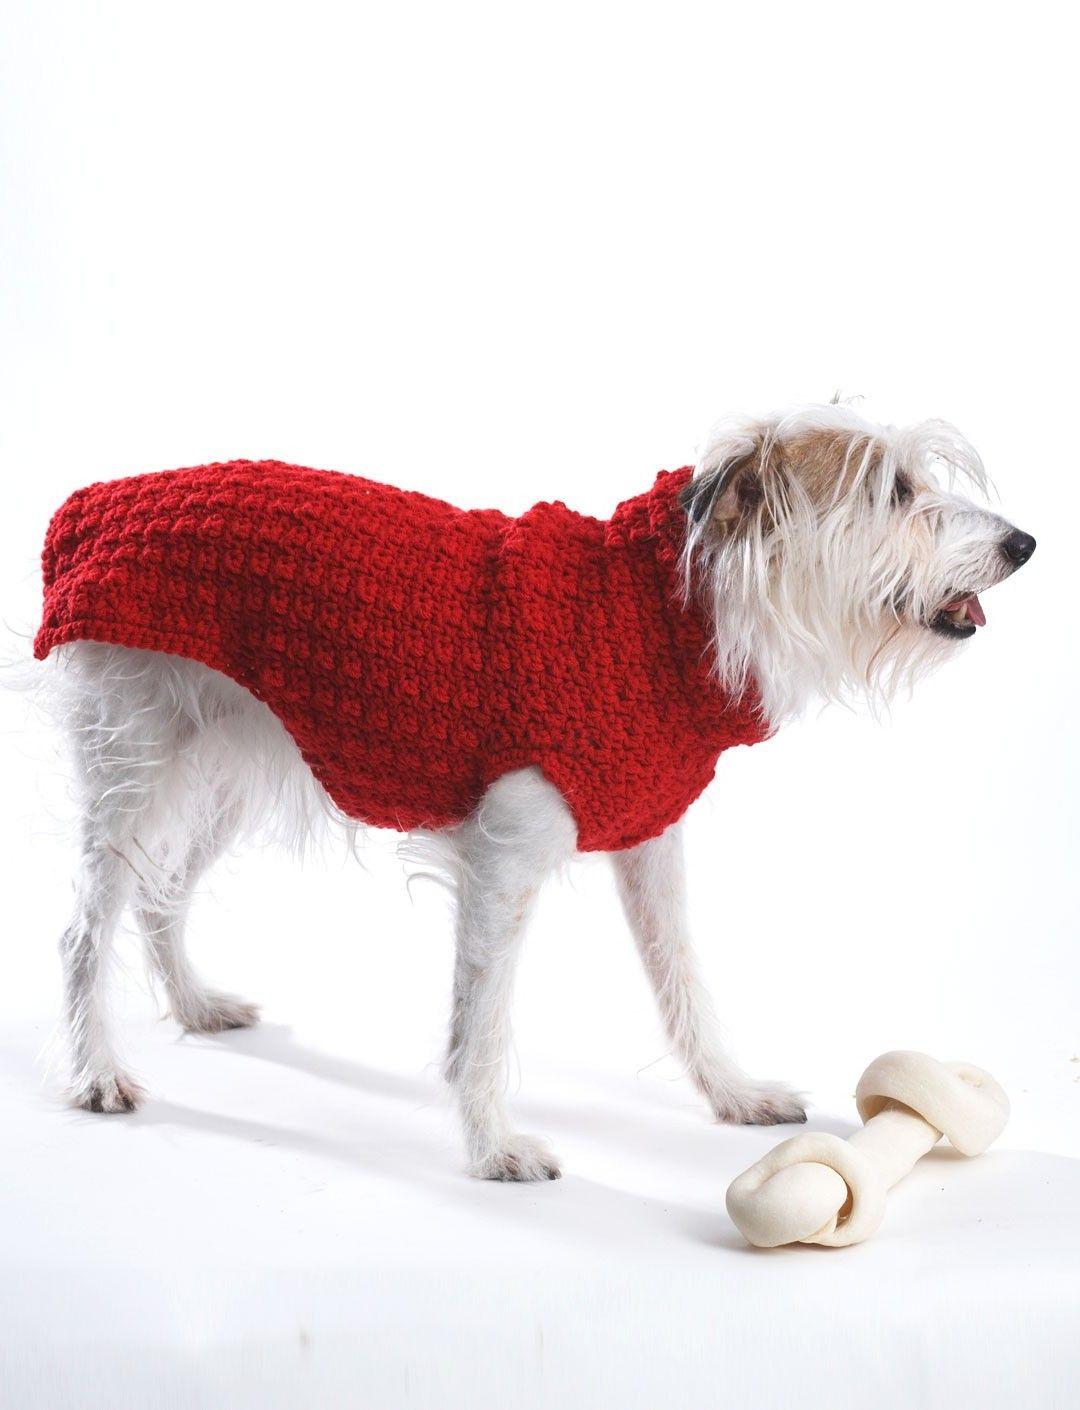 Hundepullover stricken - 42 warme Ideen + Strickanleitung - DIY ...